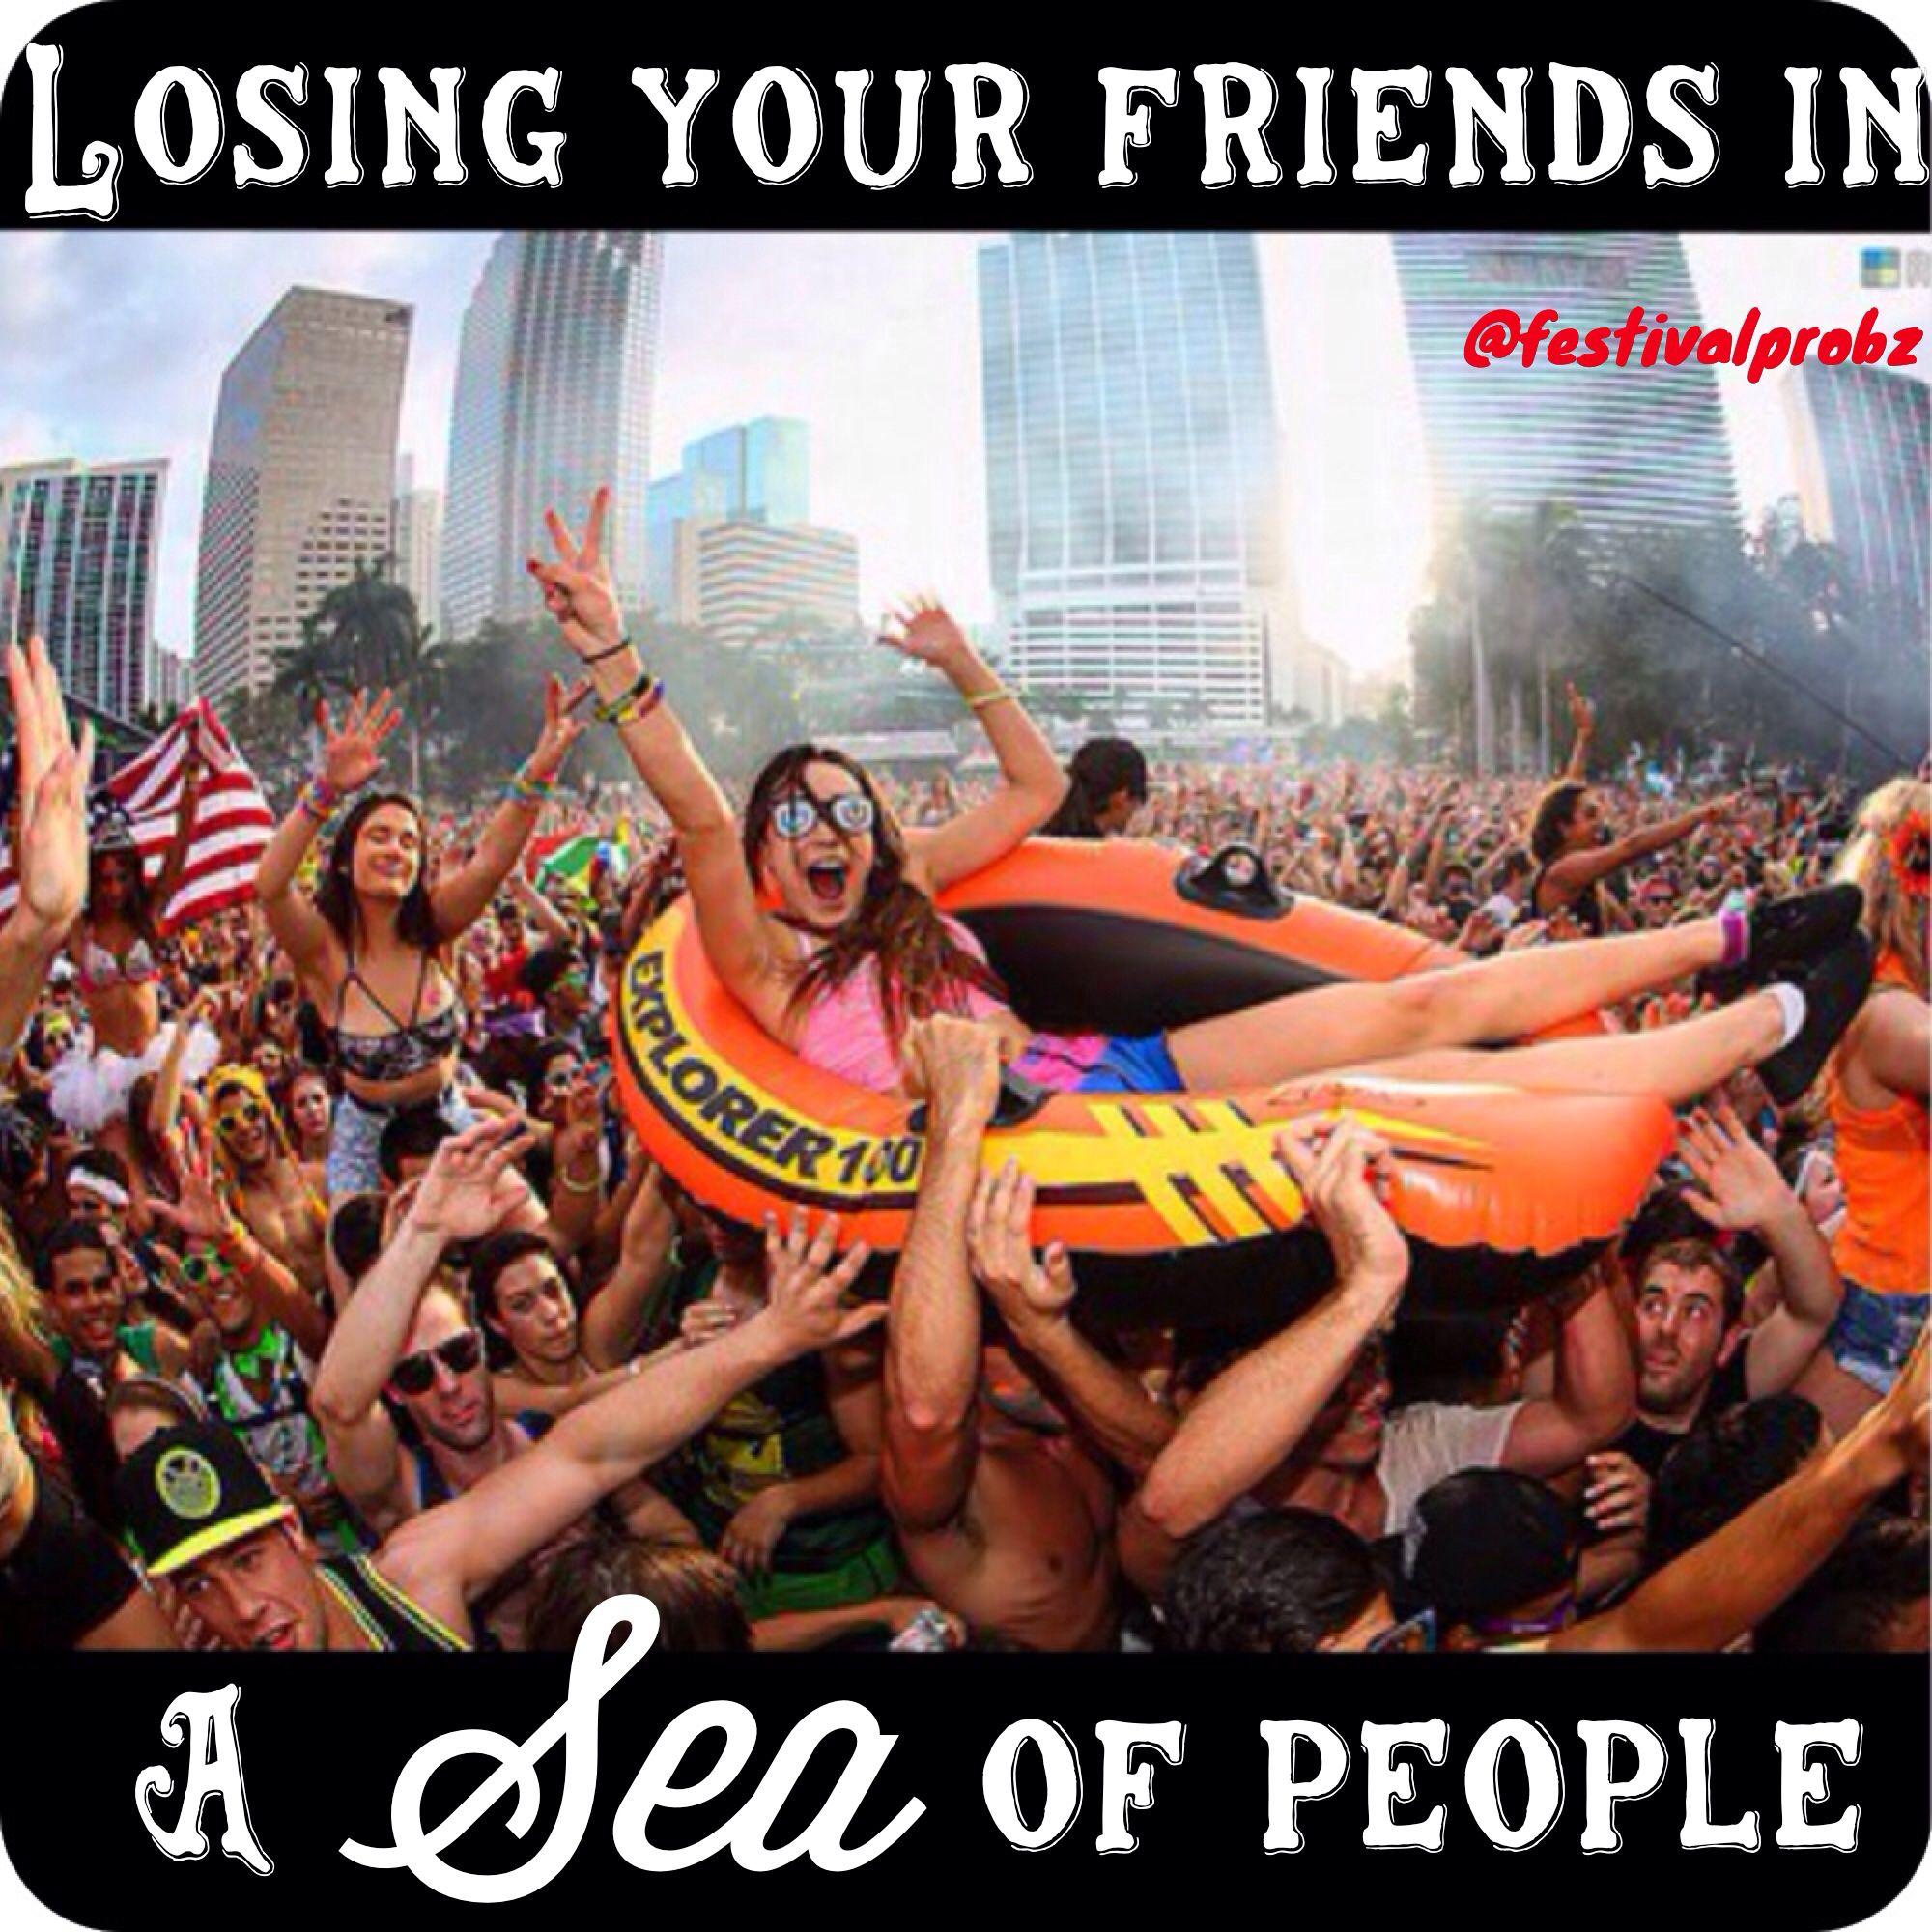 cfd832542e0c16a39e1e085cca8726d9 edm rave musicfestivals ultra umf memes pinterest edm